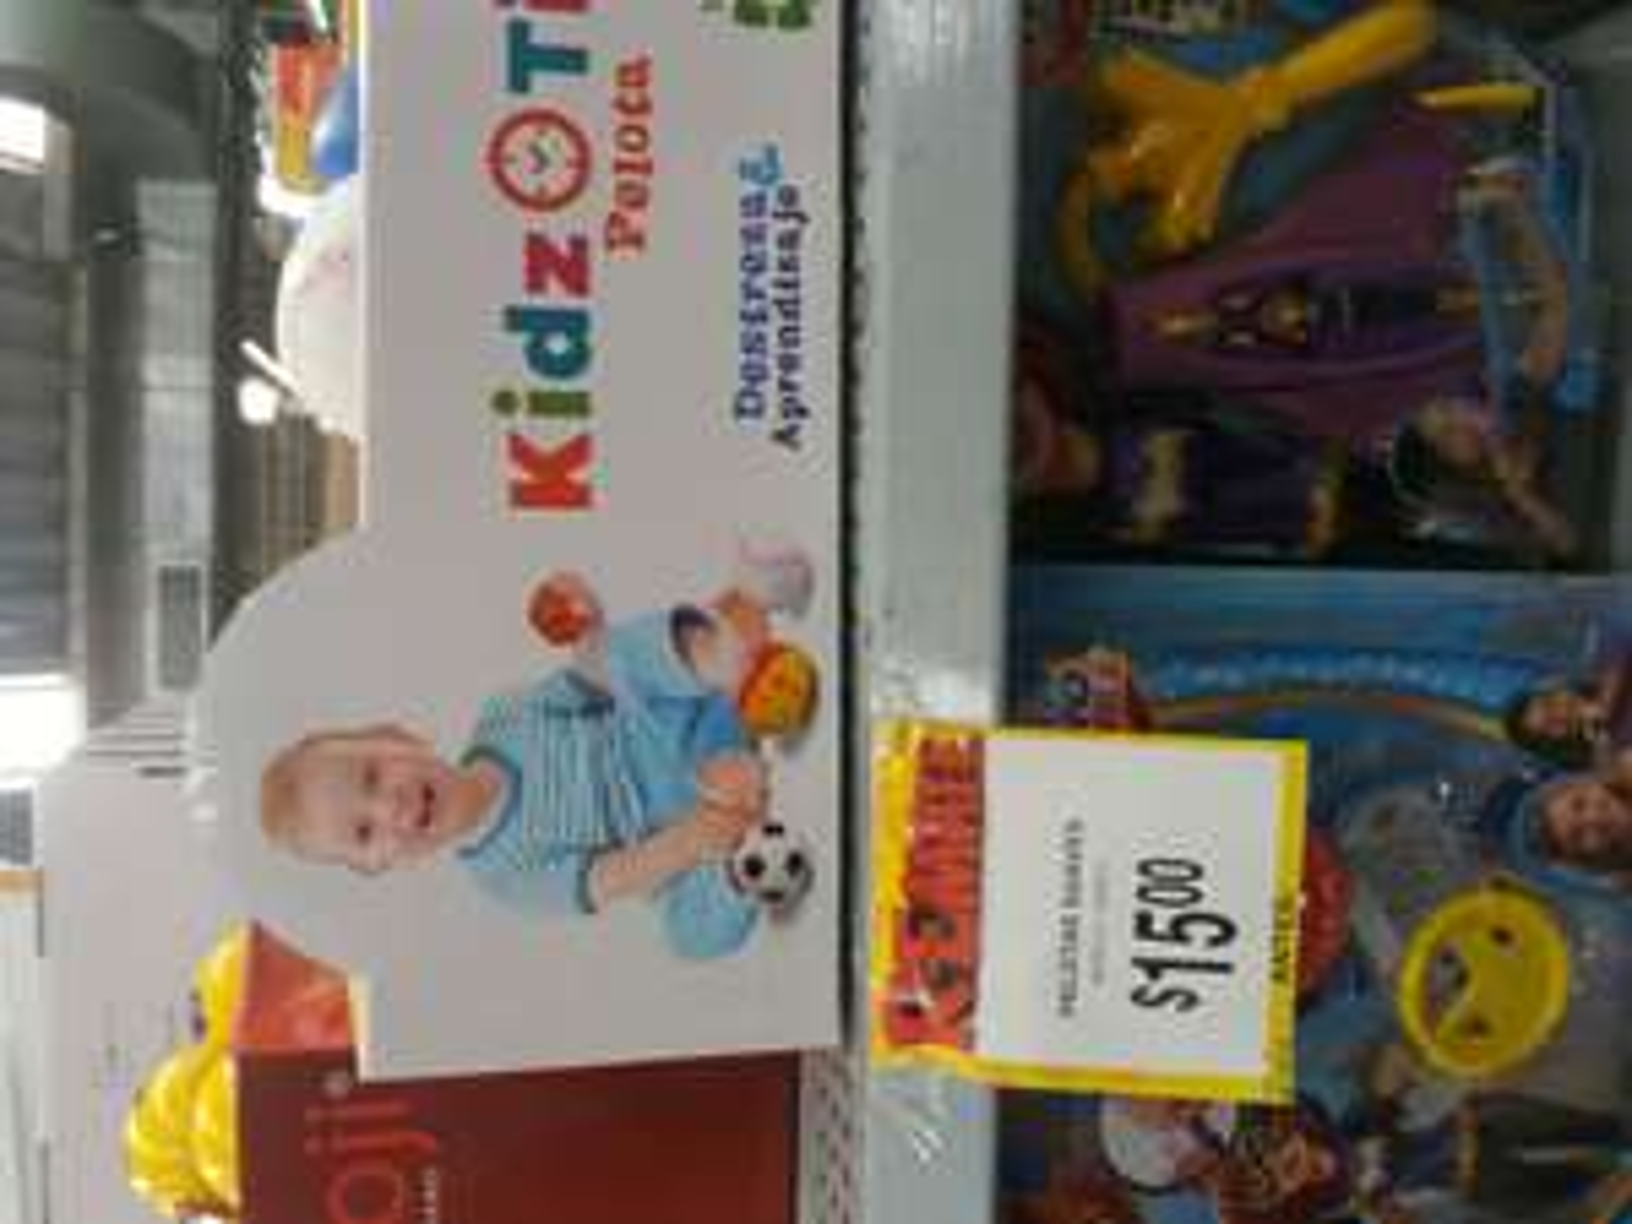 Bodega Aurrerá: Pelotas para bebés en $15 pesos